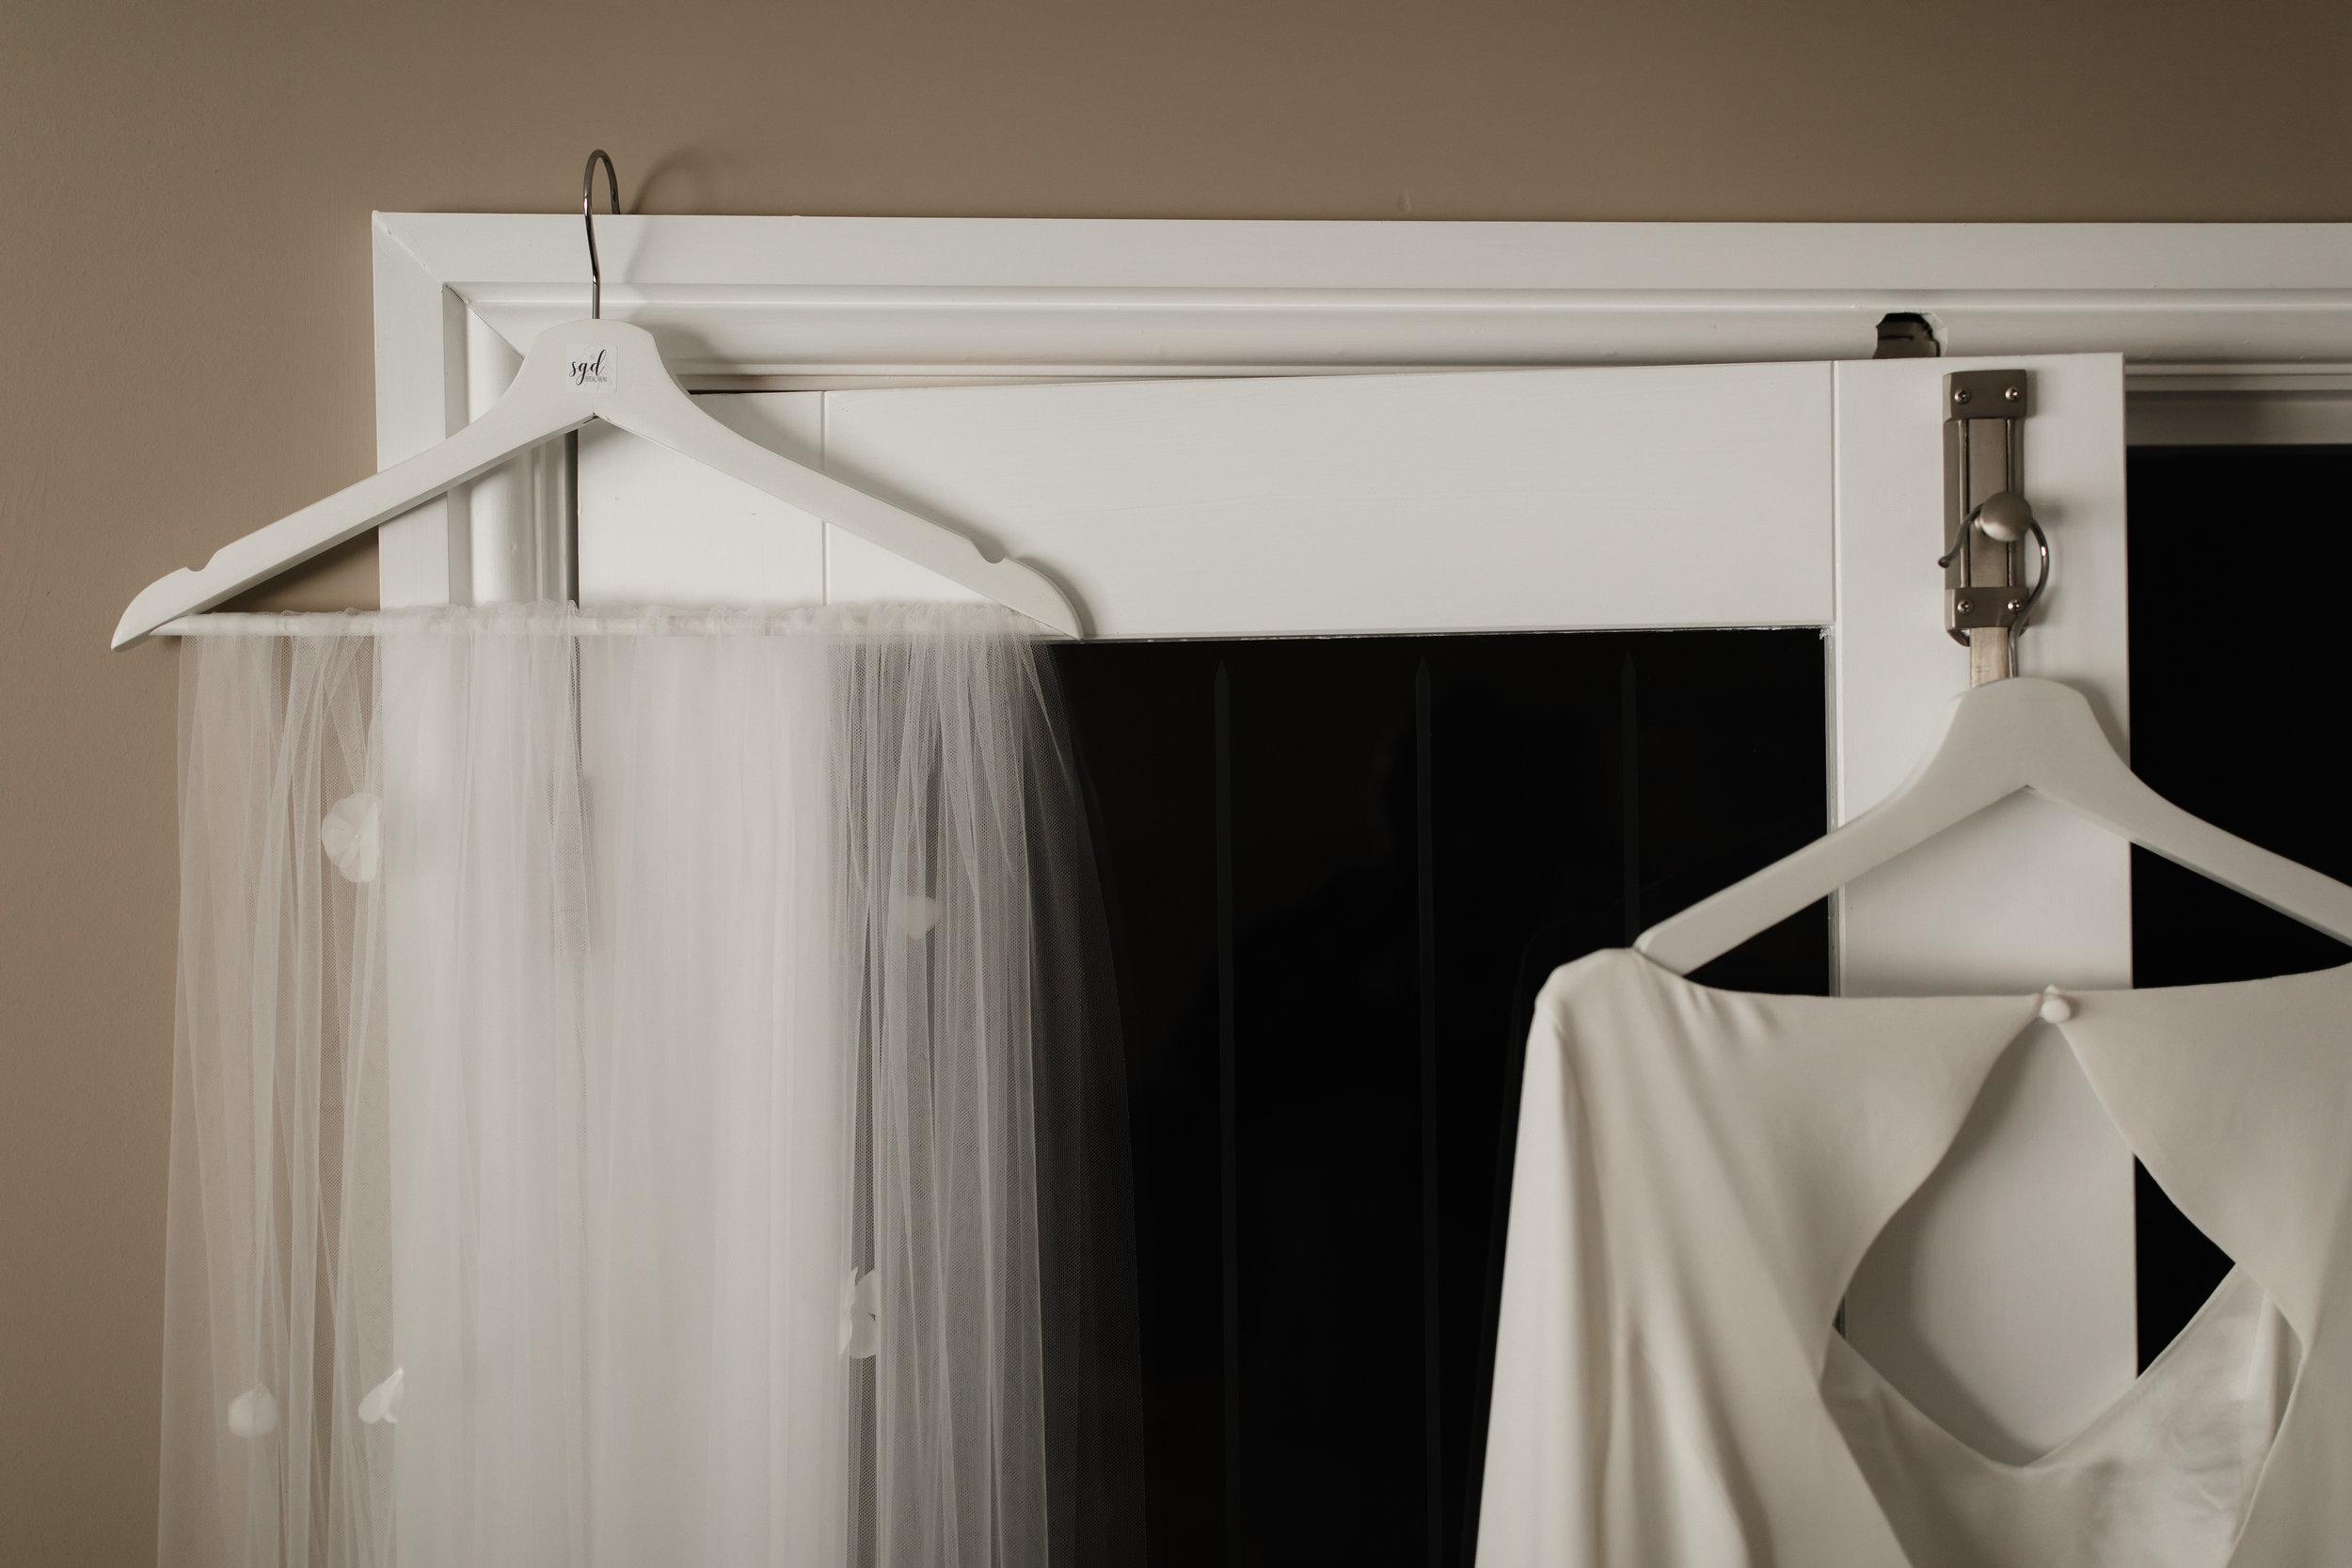 Lauren-Peak-District-Bespoke-Wedding-Gown-Petal-Veil-Train-Long-Sleeve-Susanna-Greening-Designs-Matlock-Derbyshire-7